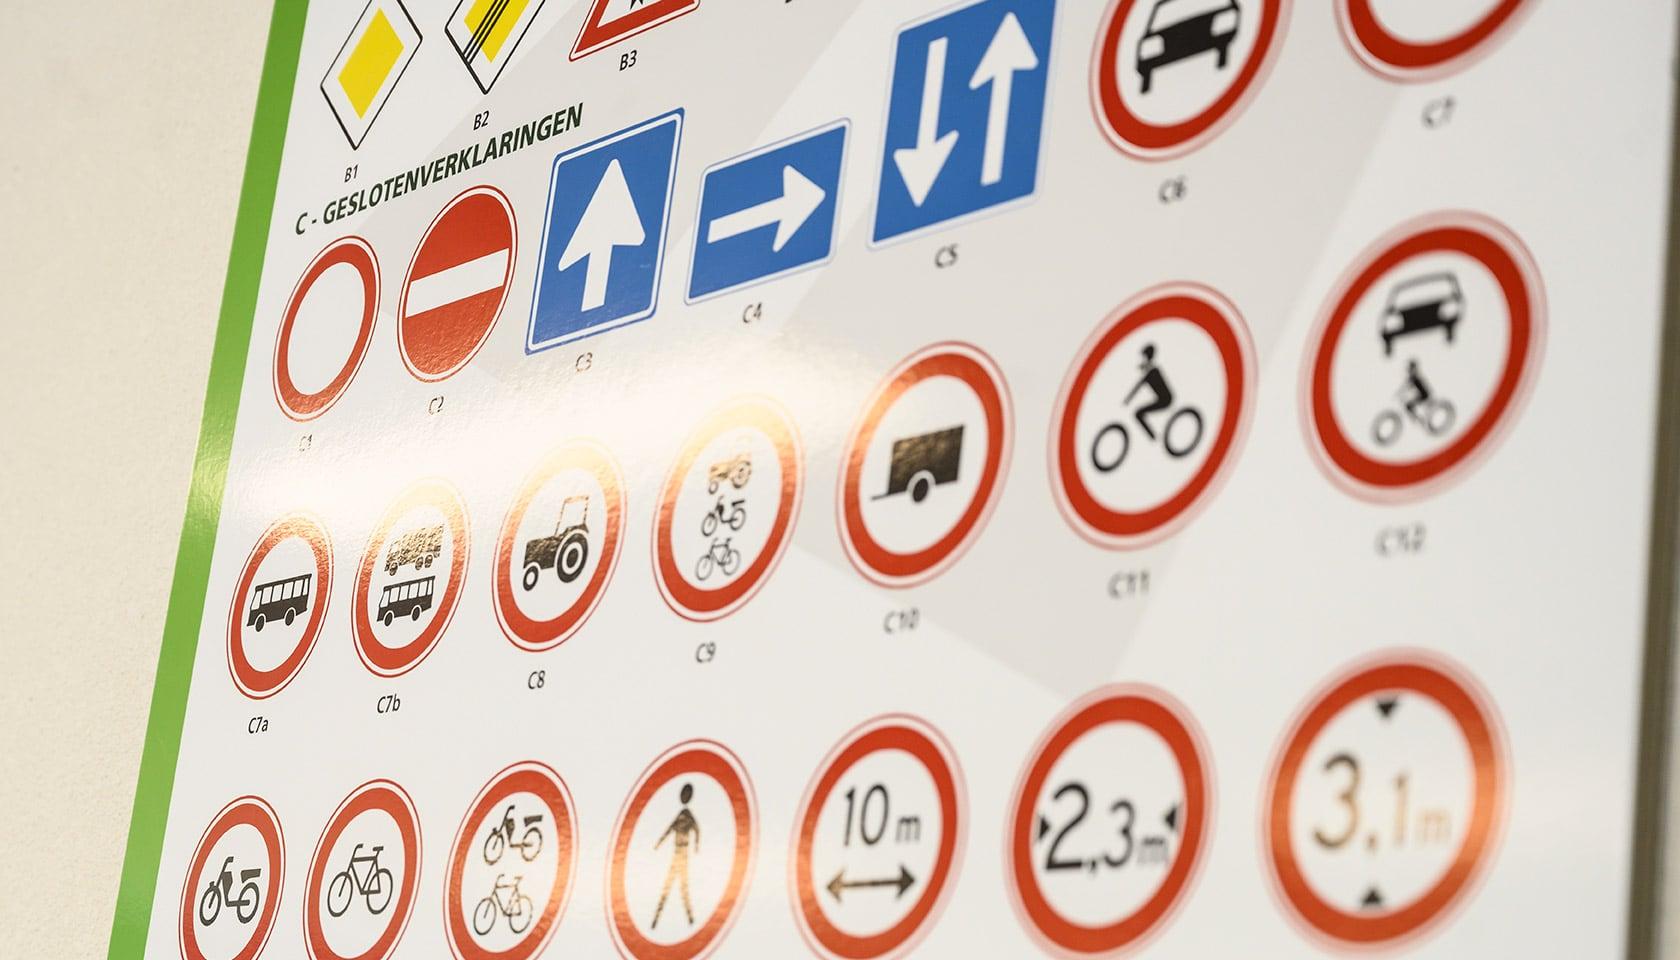 62: Wegenverkeerswet (WvW)